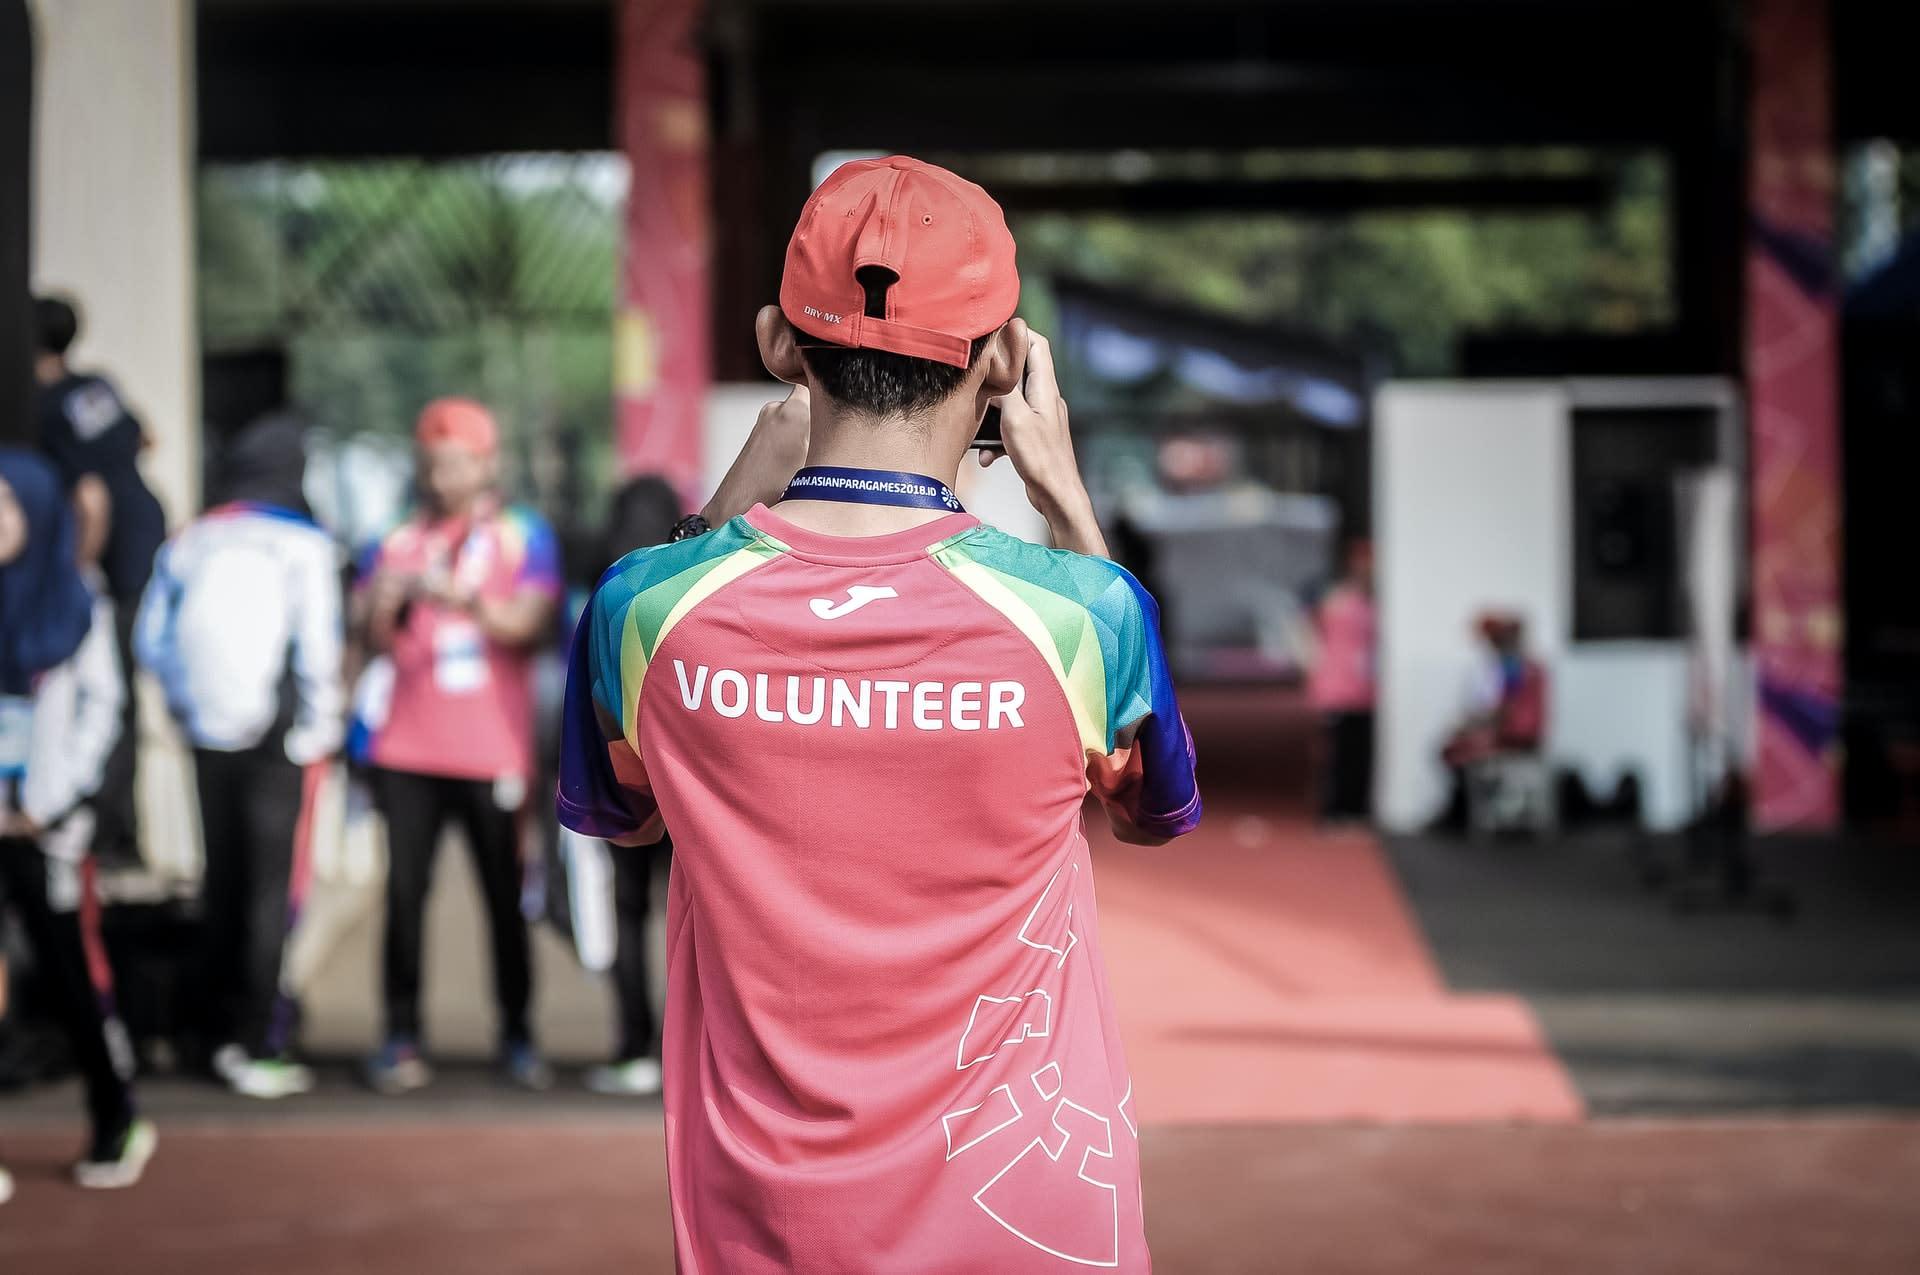 A volunteer in action